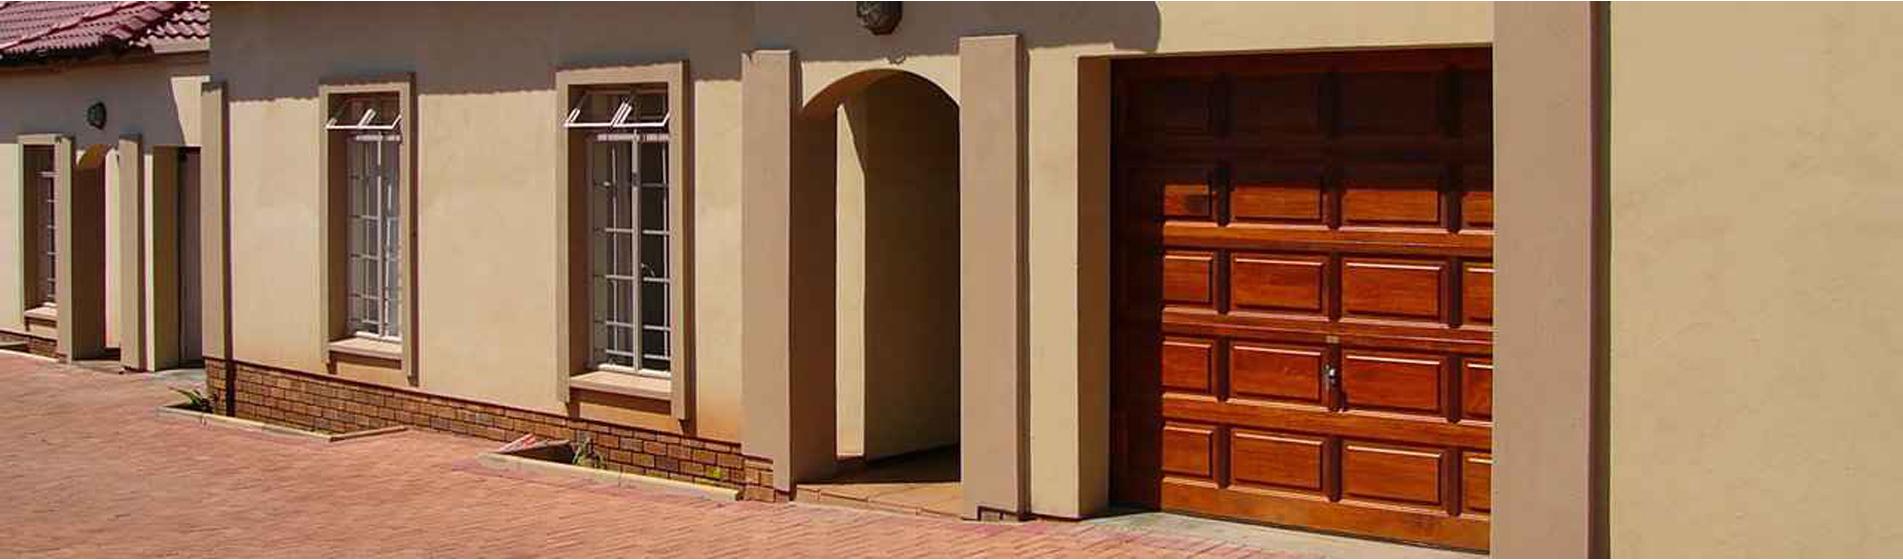 fabricant porte de garage sur-mesure 84 Vaucluse